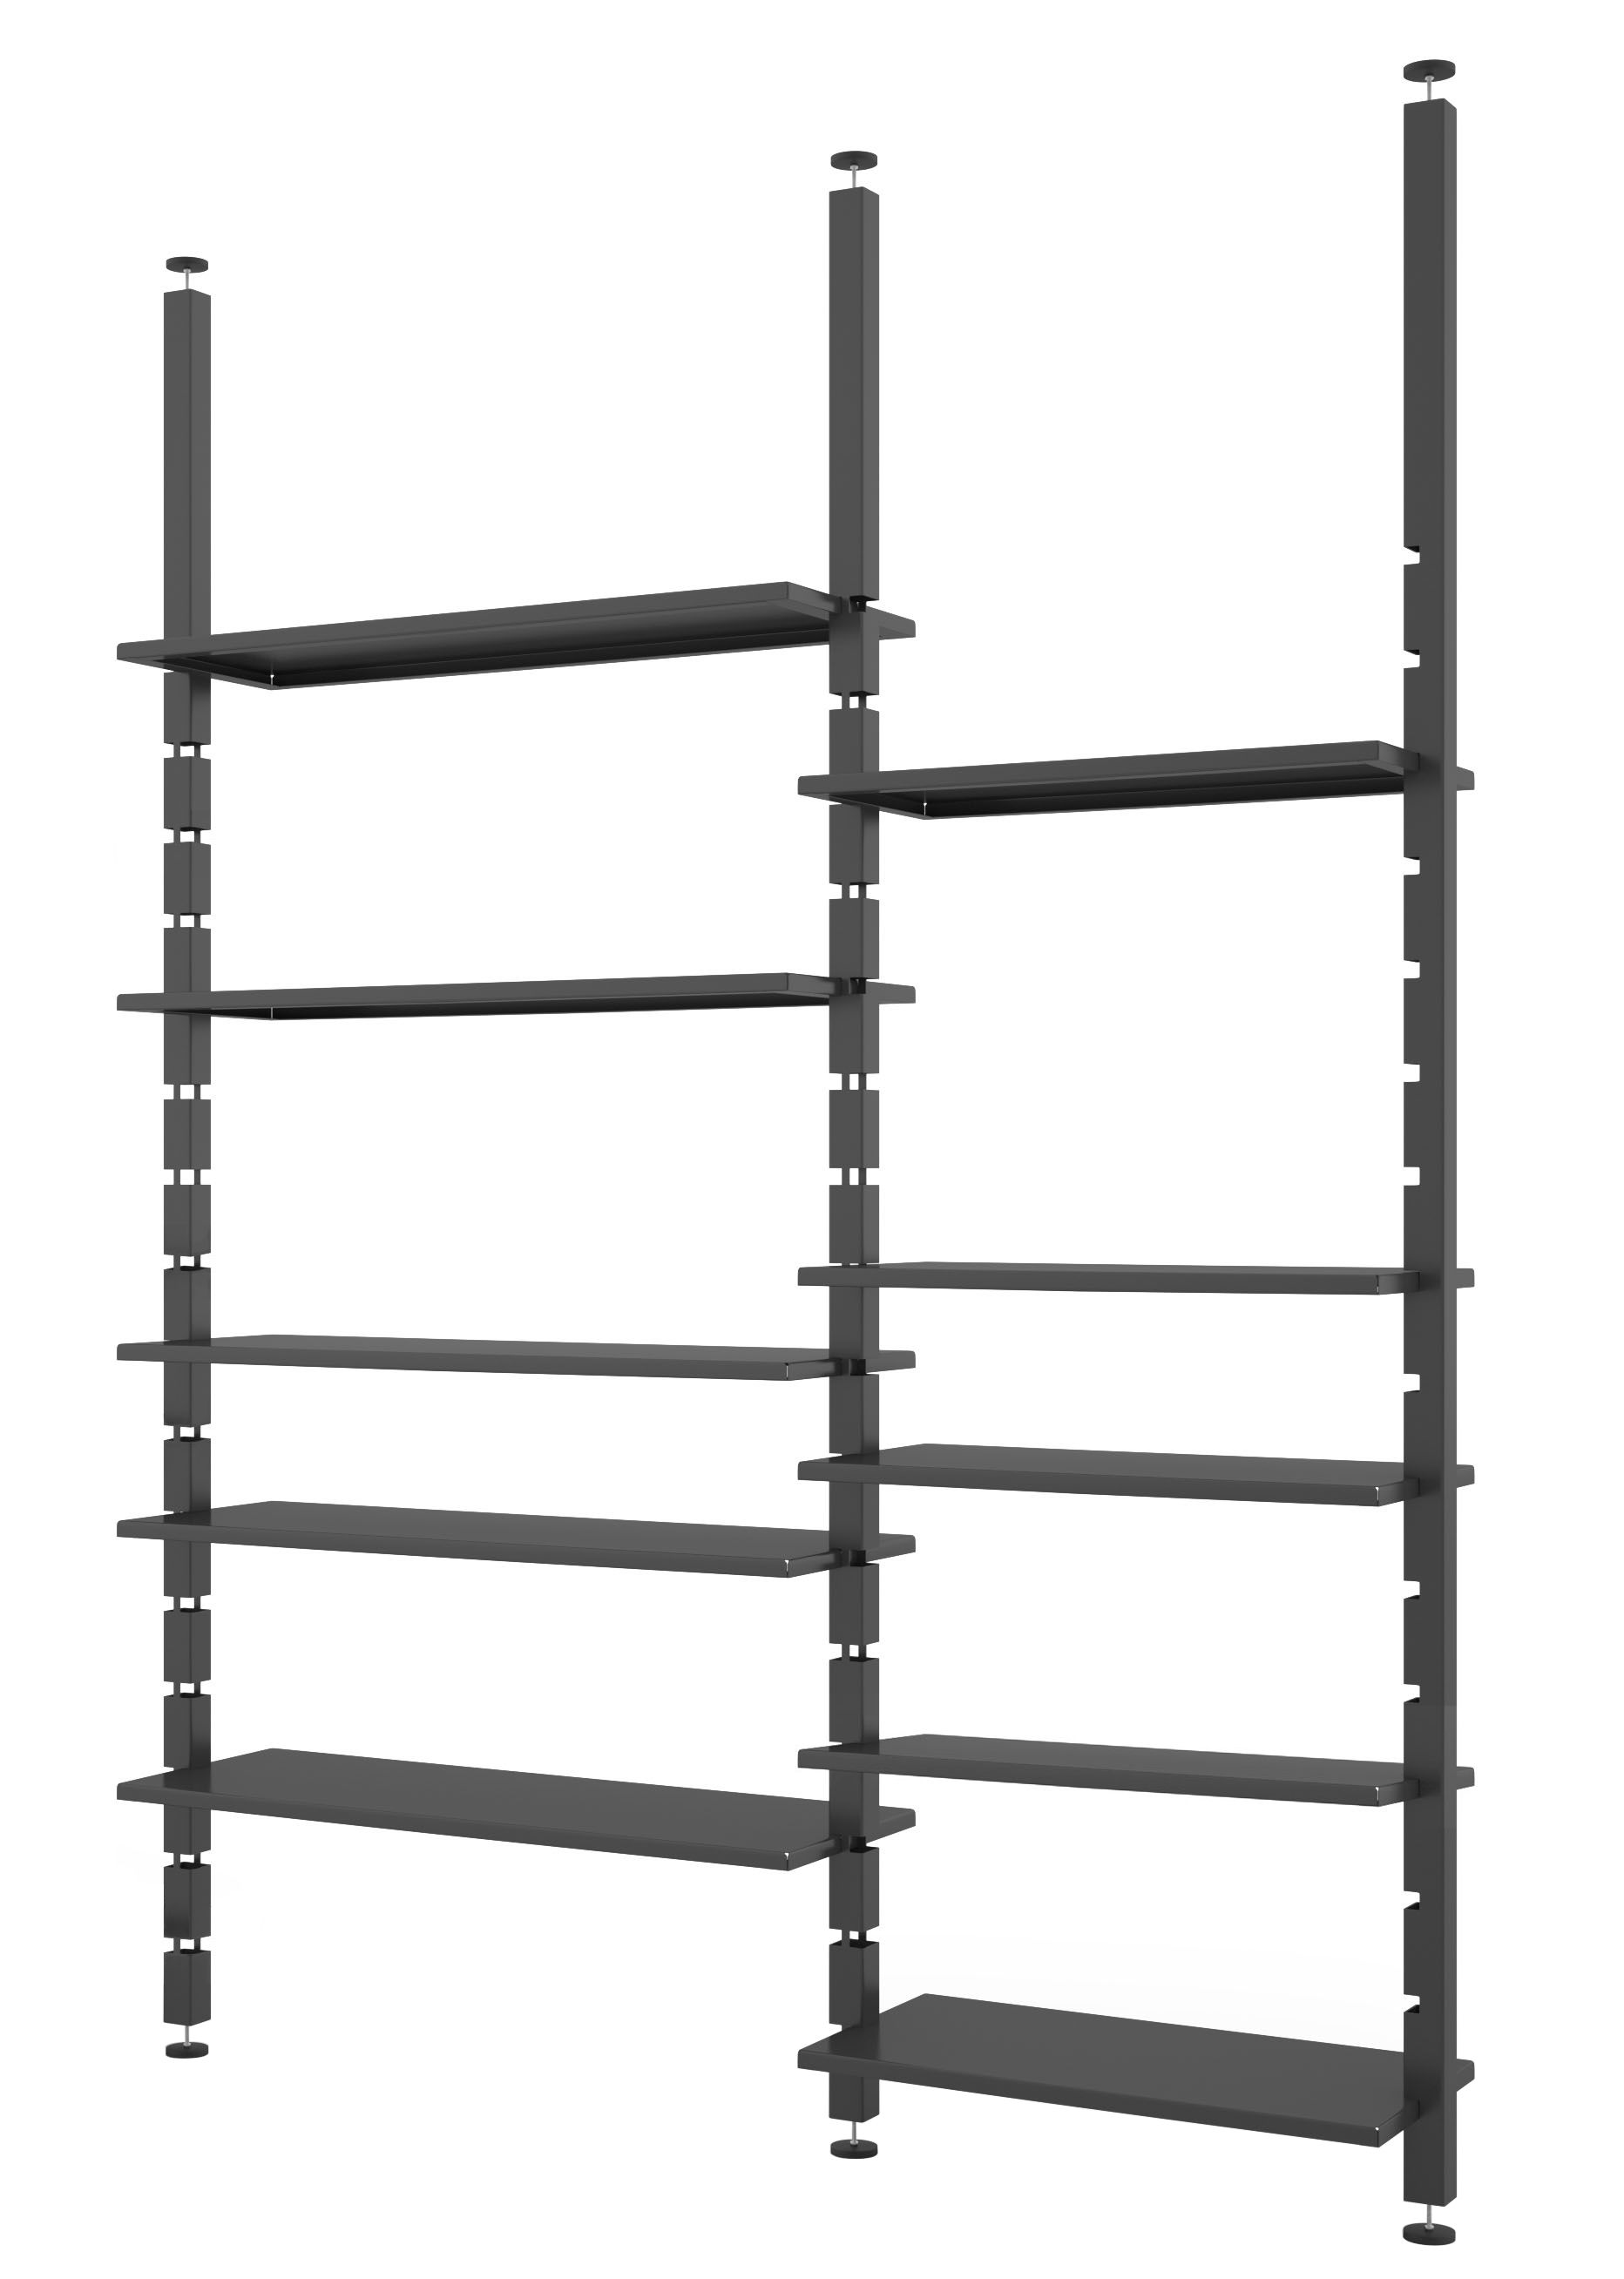 Furniture - Bookcases & Bookshelves - Kasper Bookcase - / Ceiling fixation - L 185 cm x H 240/246 cm by Zeus - Grey - Painted steel